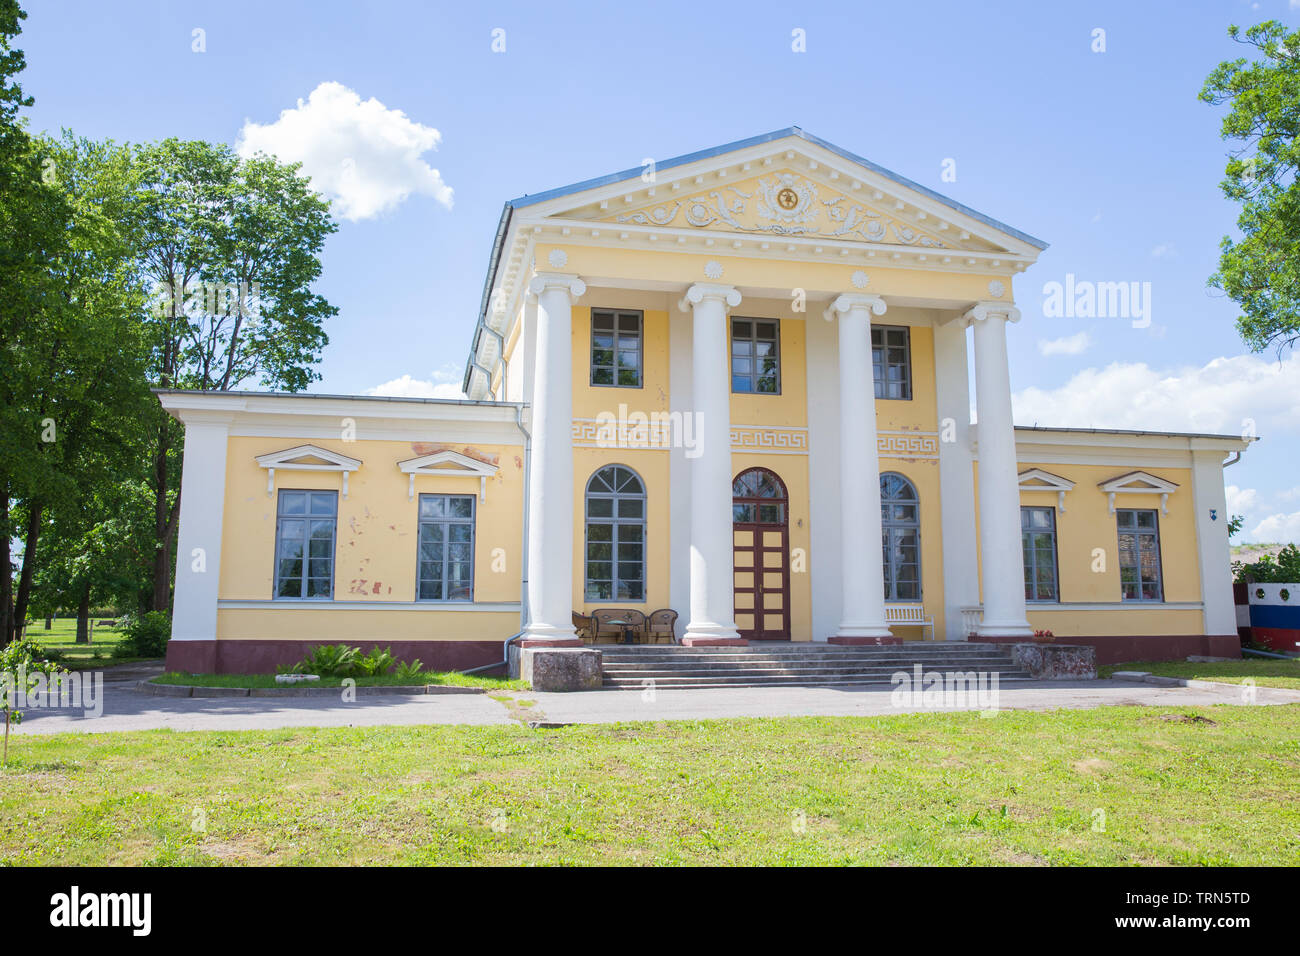 City Jelgava, Latvian Republic. Old yellow manor houses and garden. Jun 9. 2019. Travel photo. Stock Photo